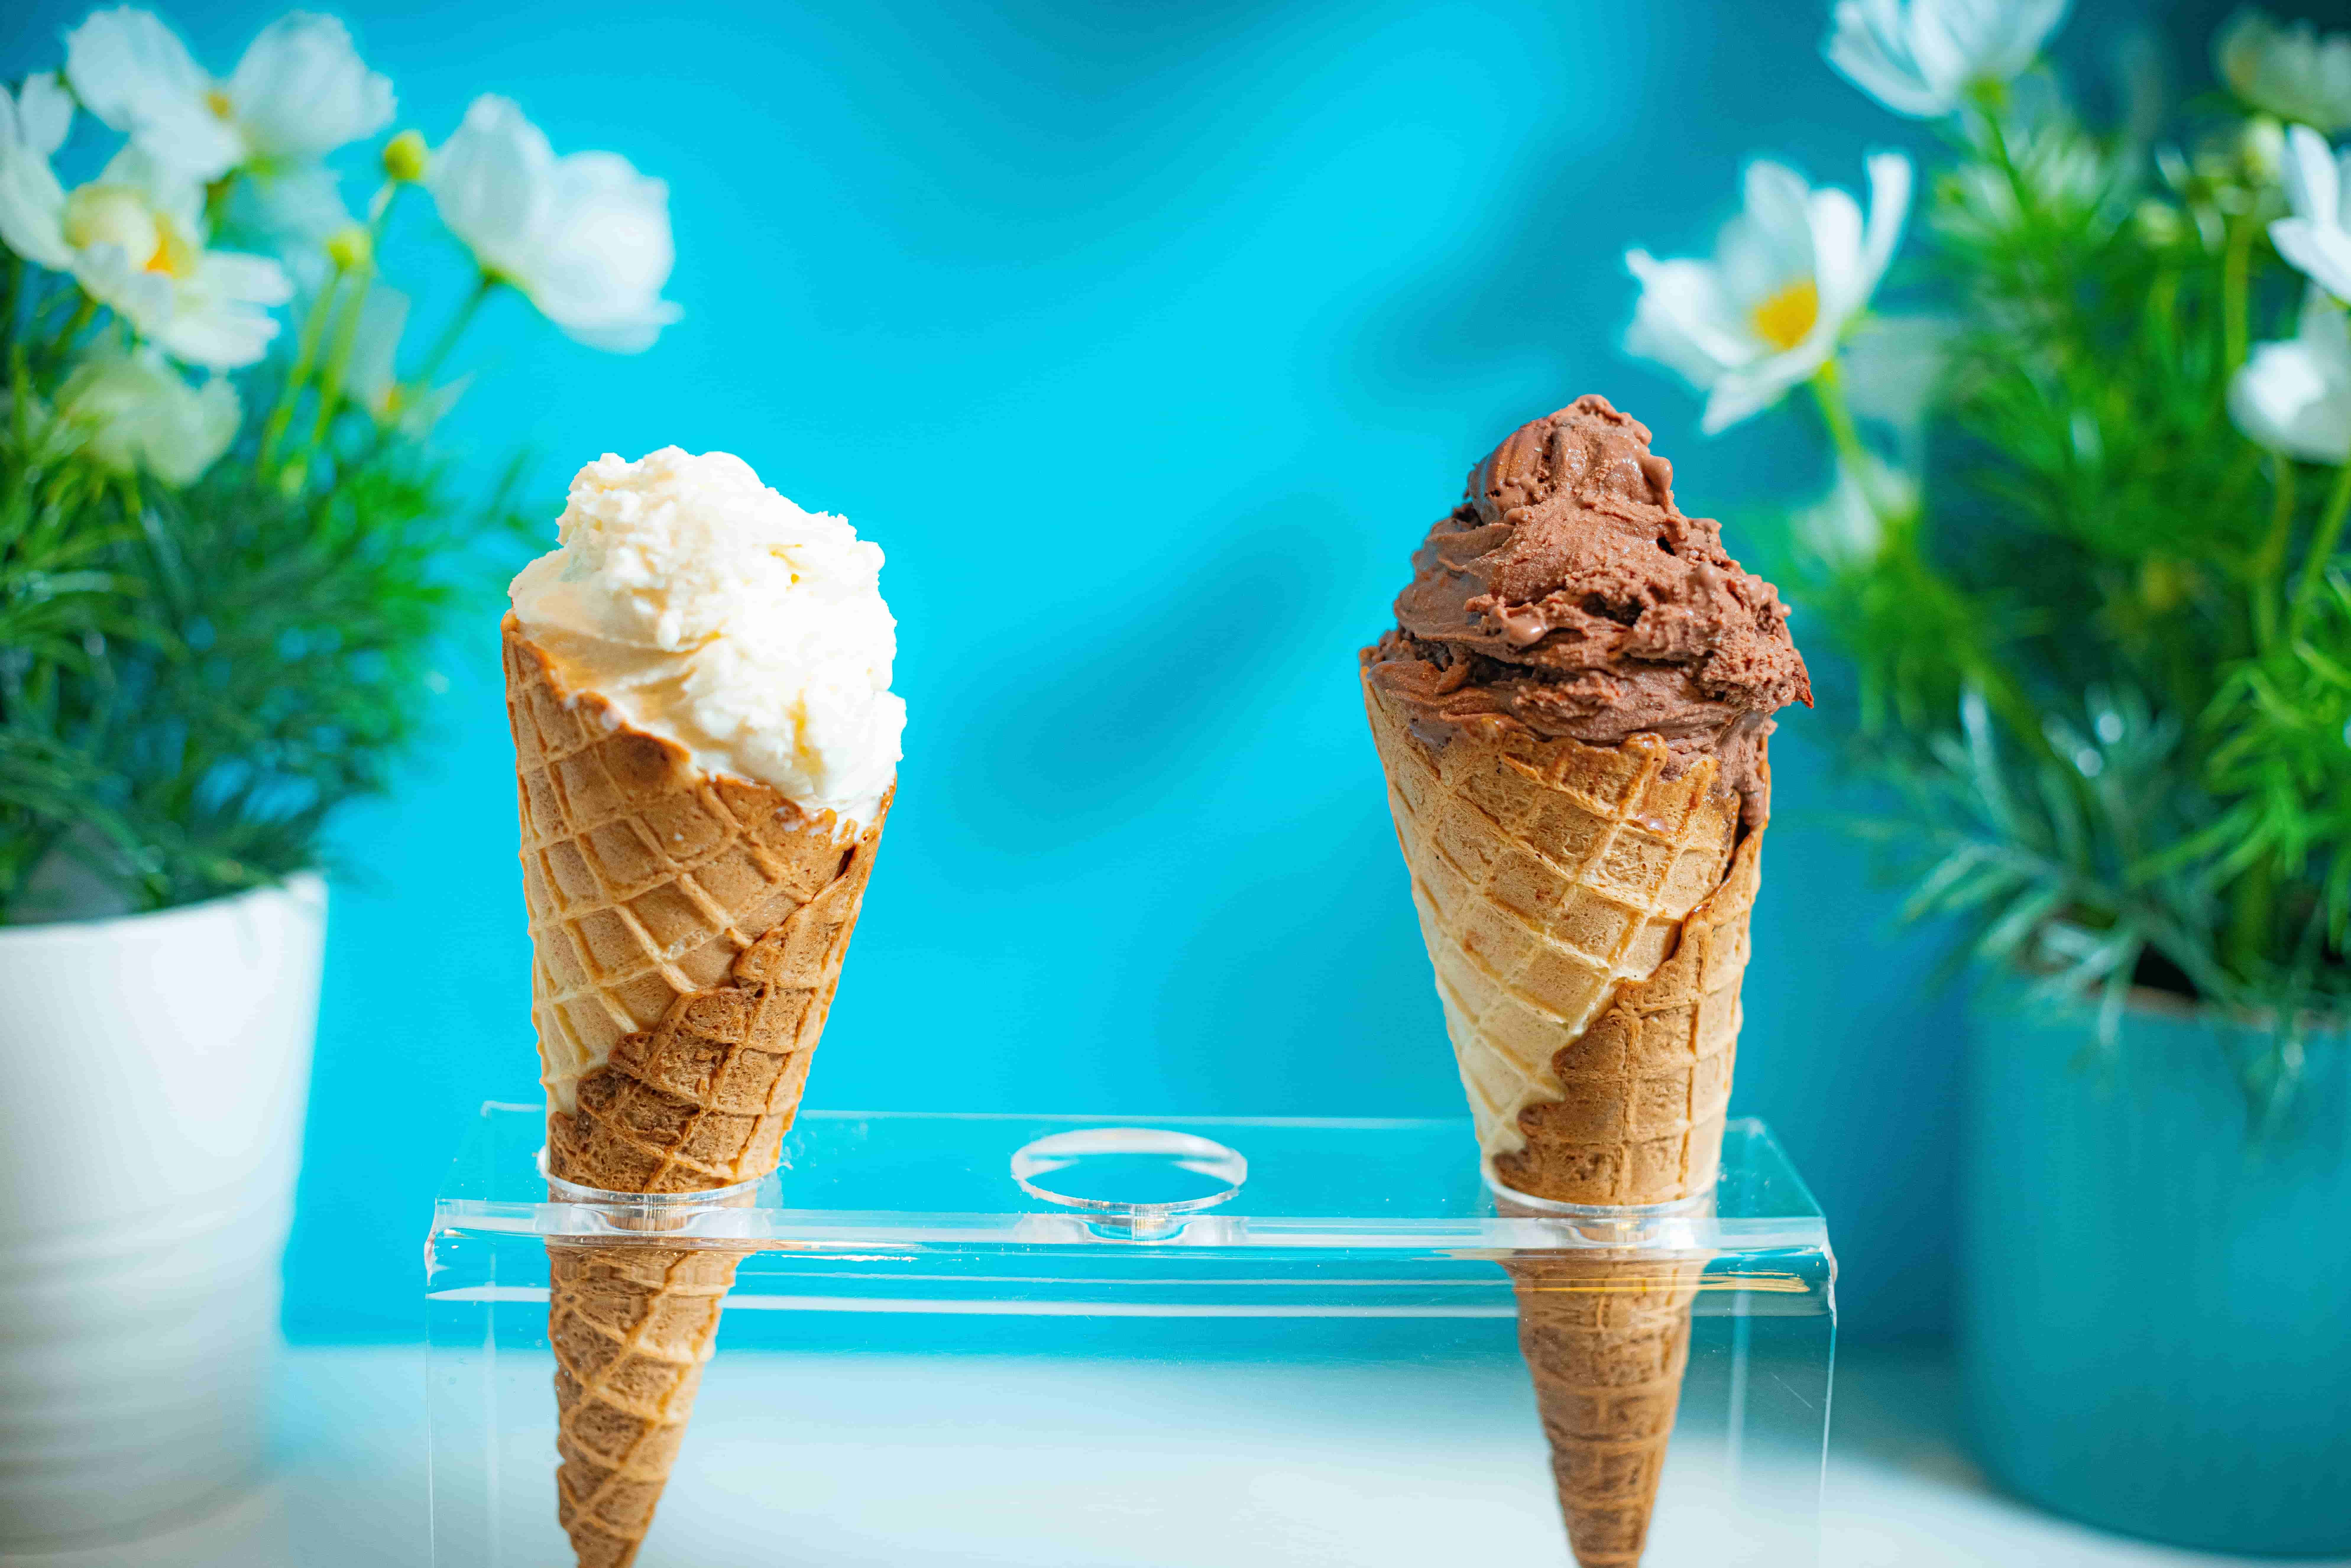 13 Impeccable Ice Cream Shops in London